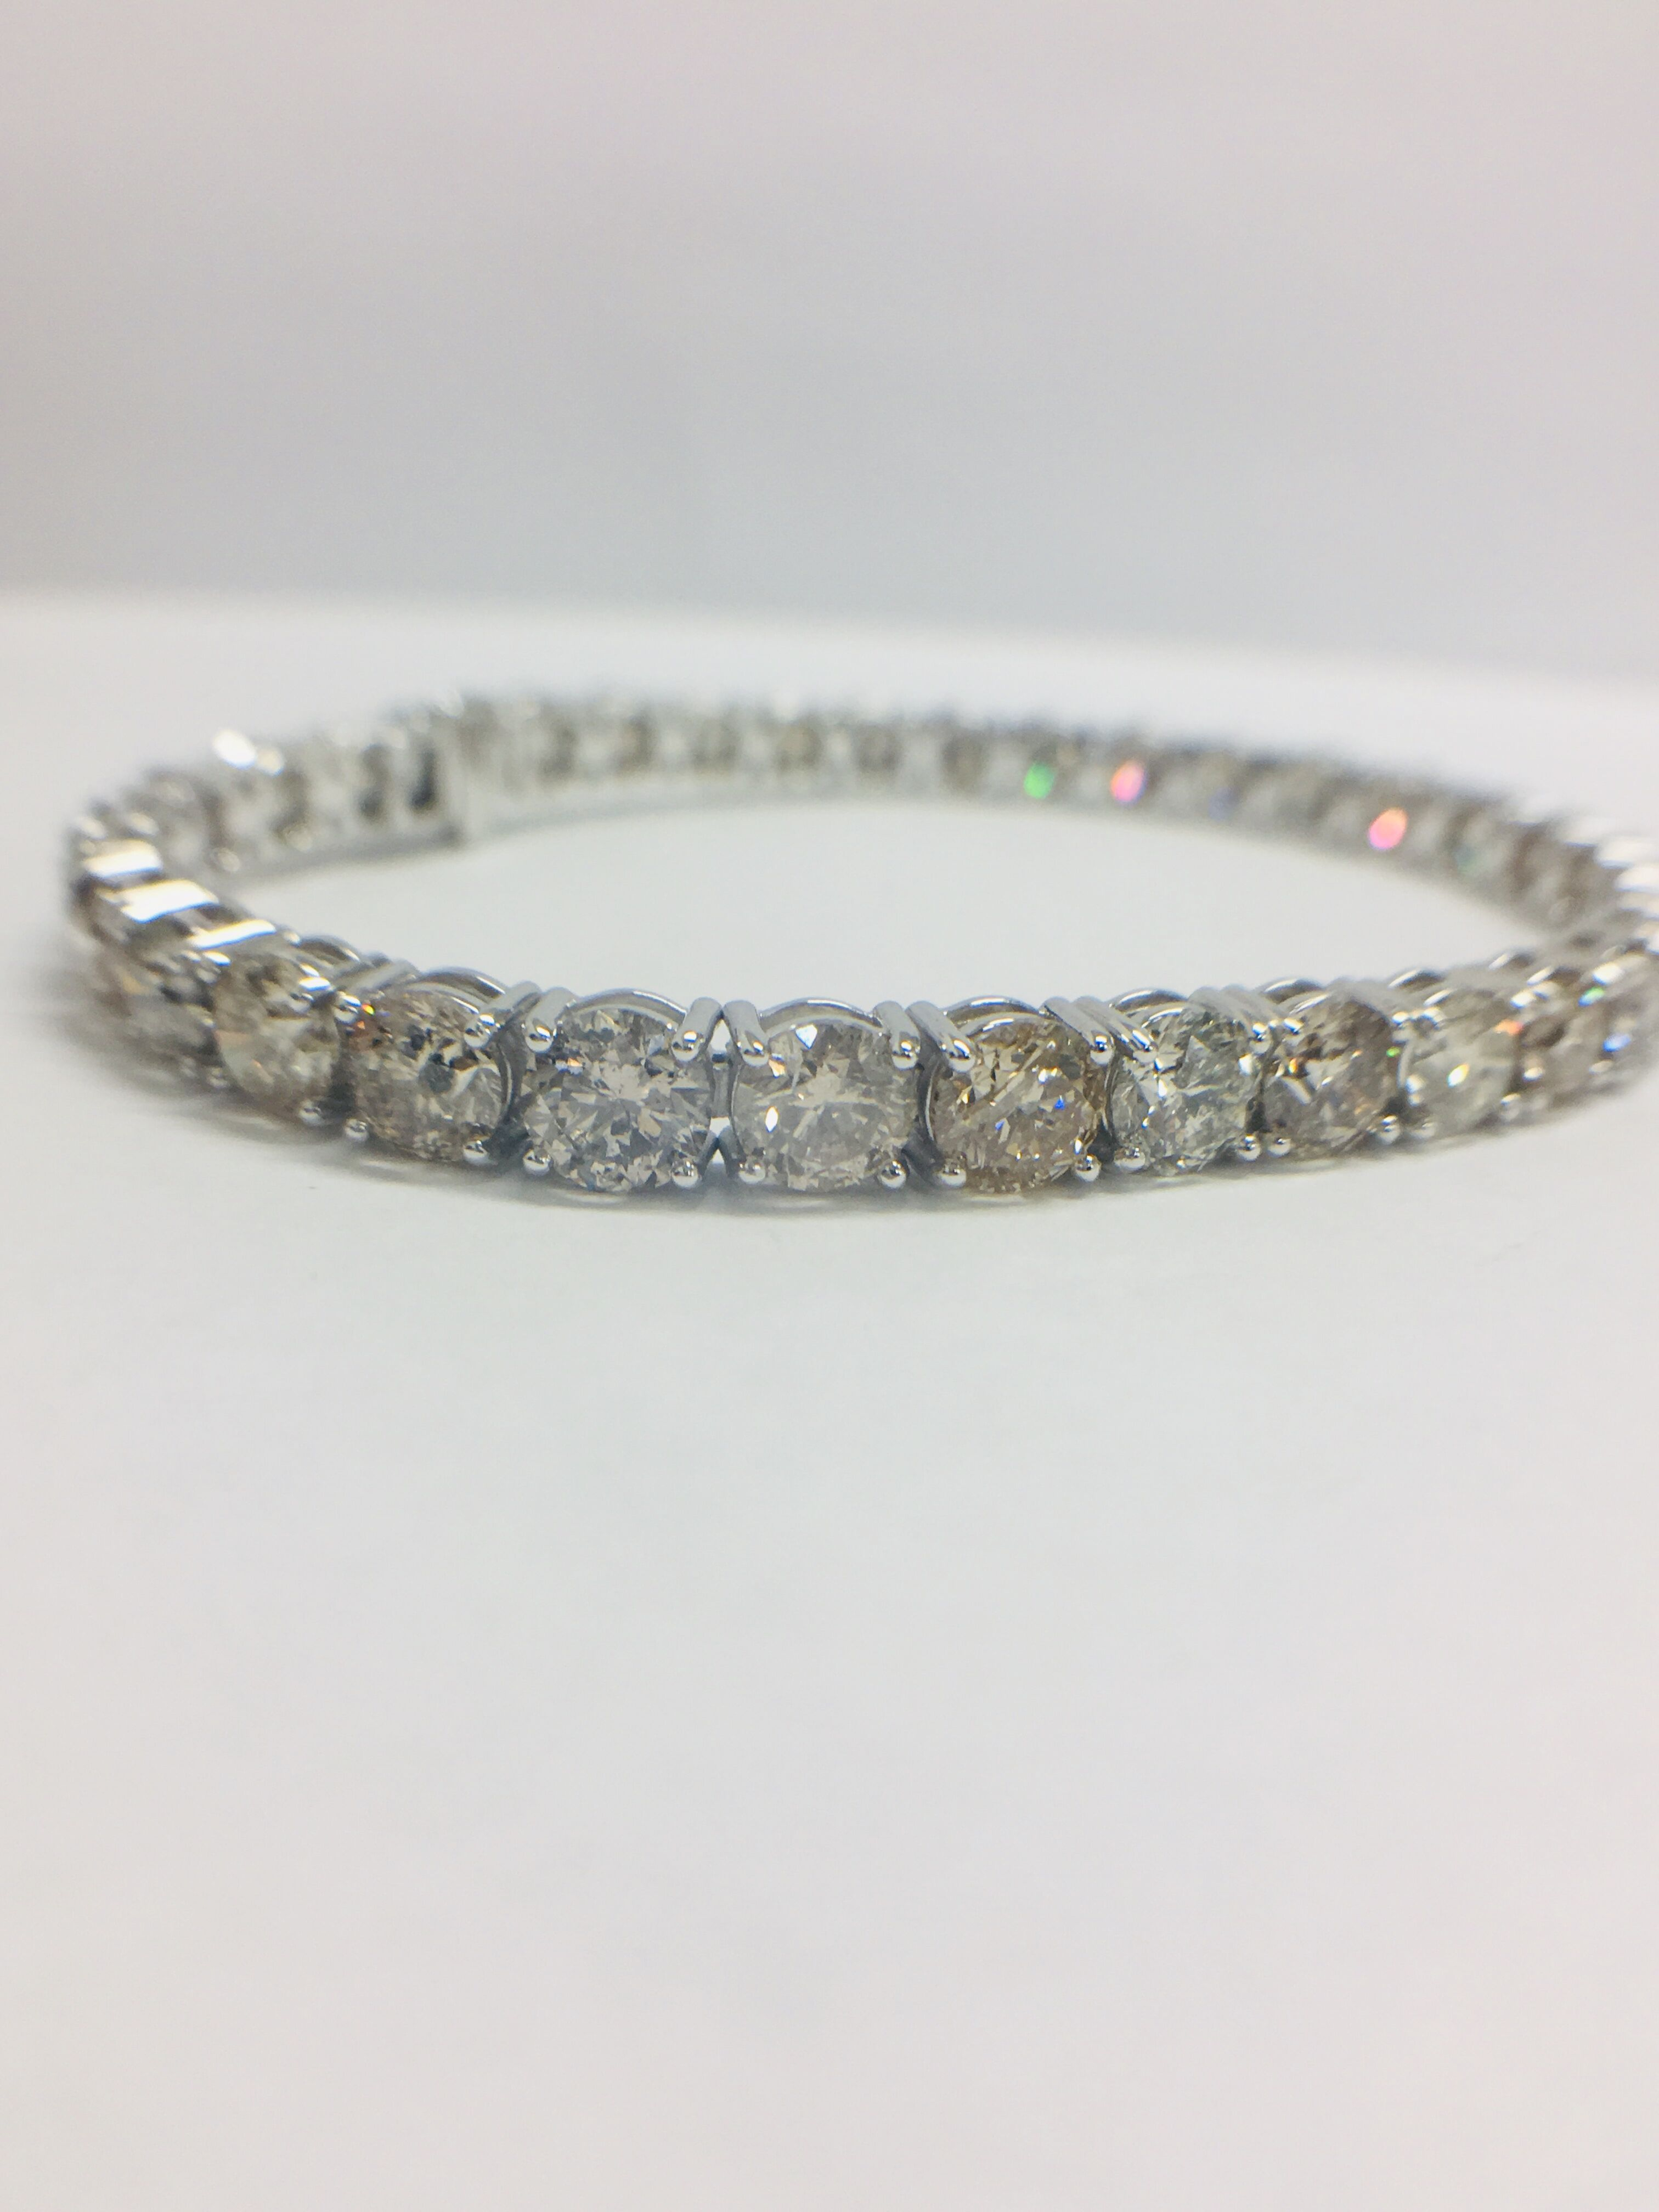 Lot 3 - 18ct White Gold Diamond Tennis Bracelet